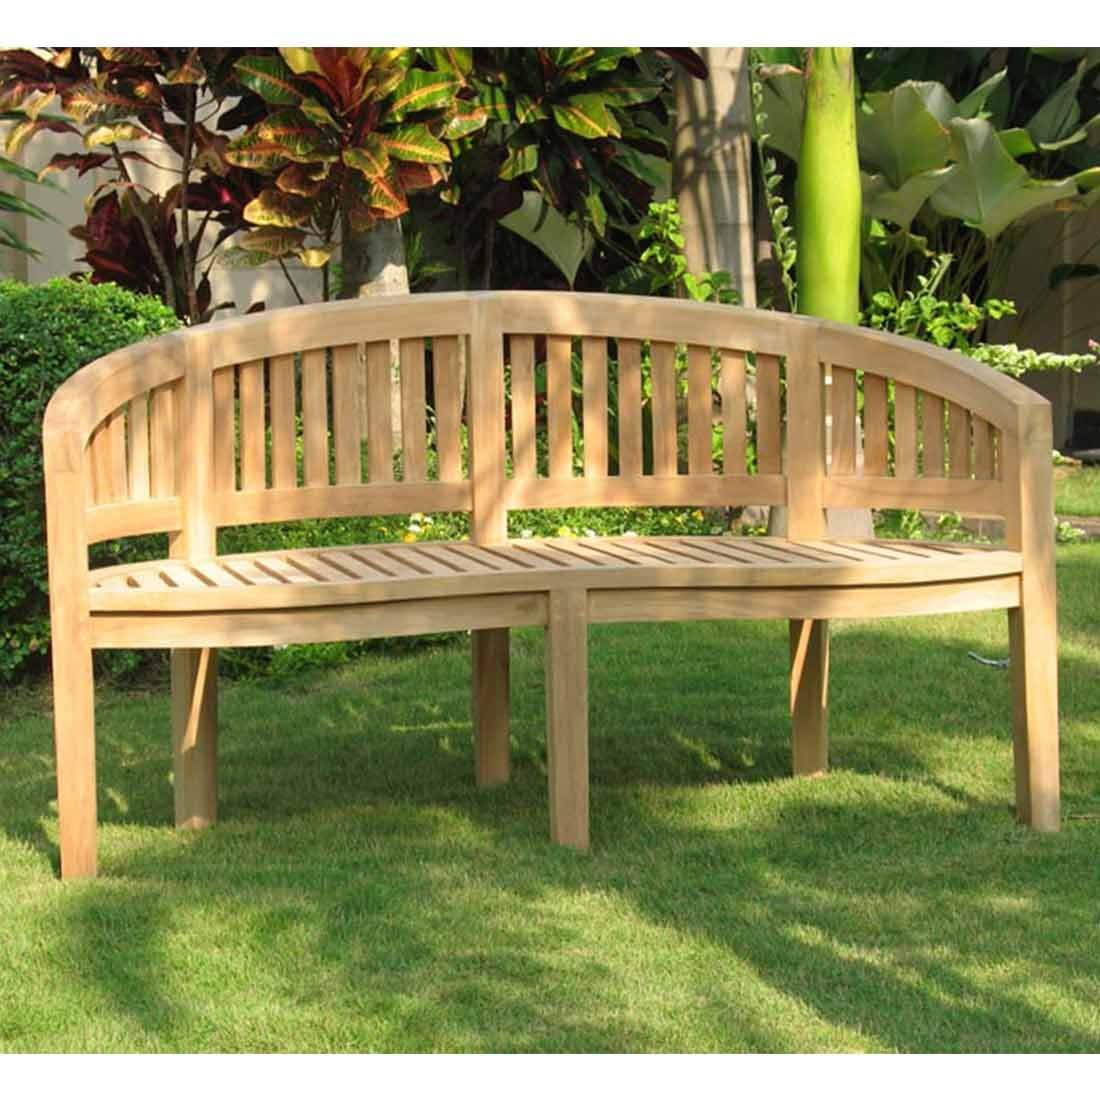 Holzbank Garten Inspirierend Outliv San Go 3 Sitzerbank Teak